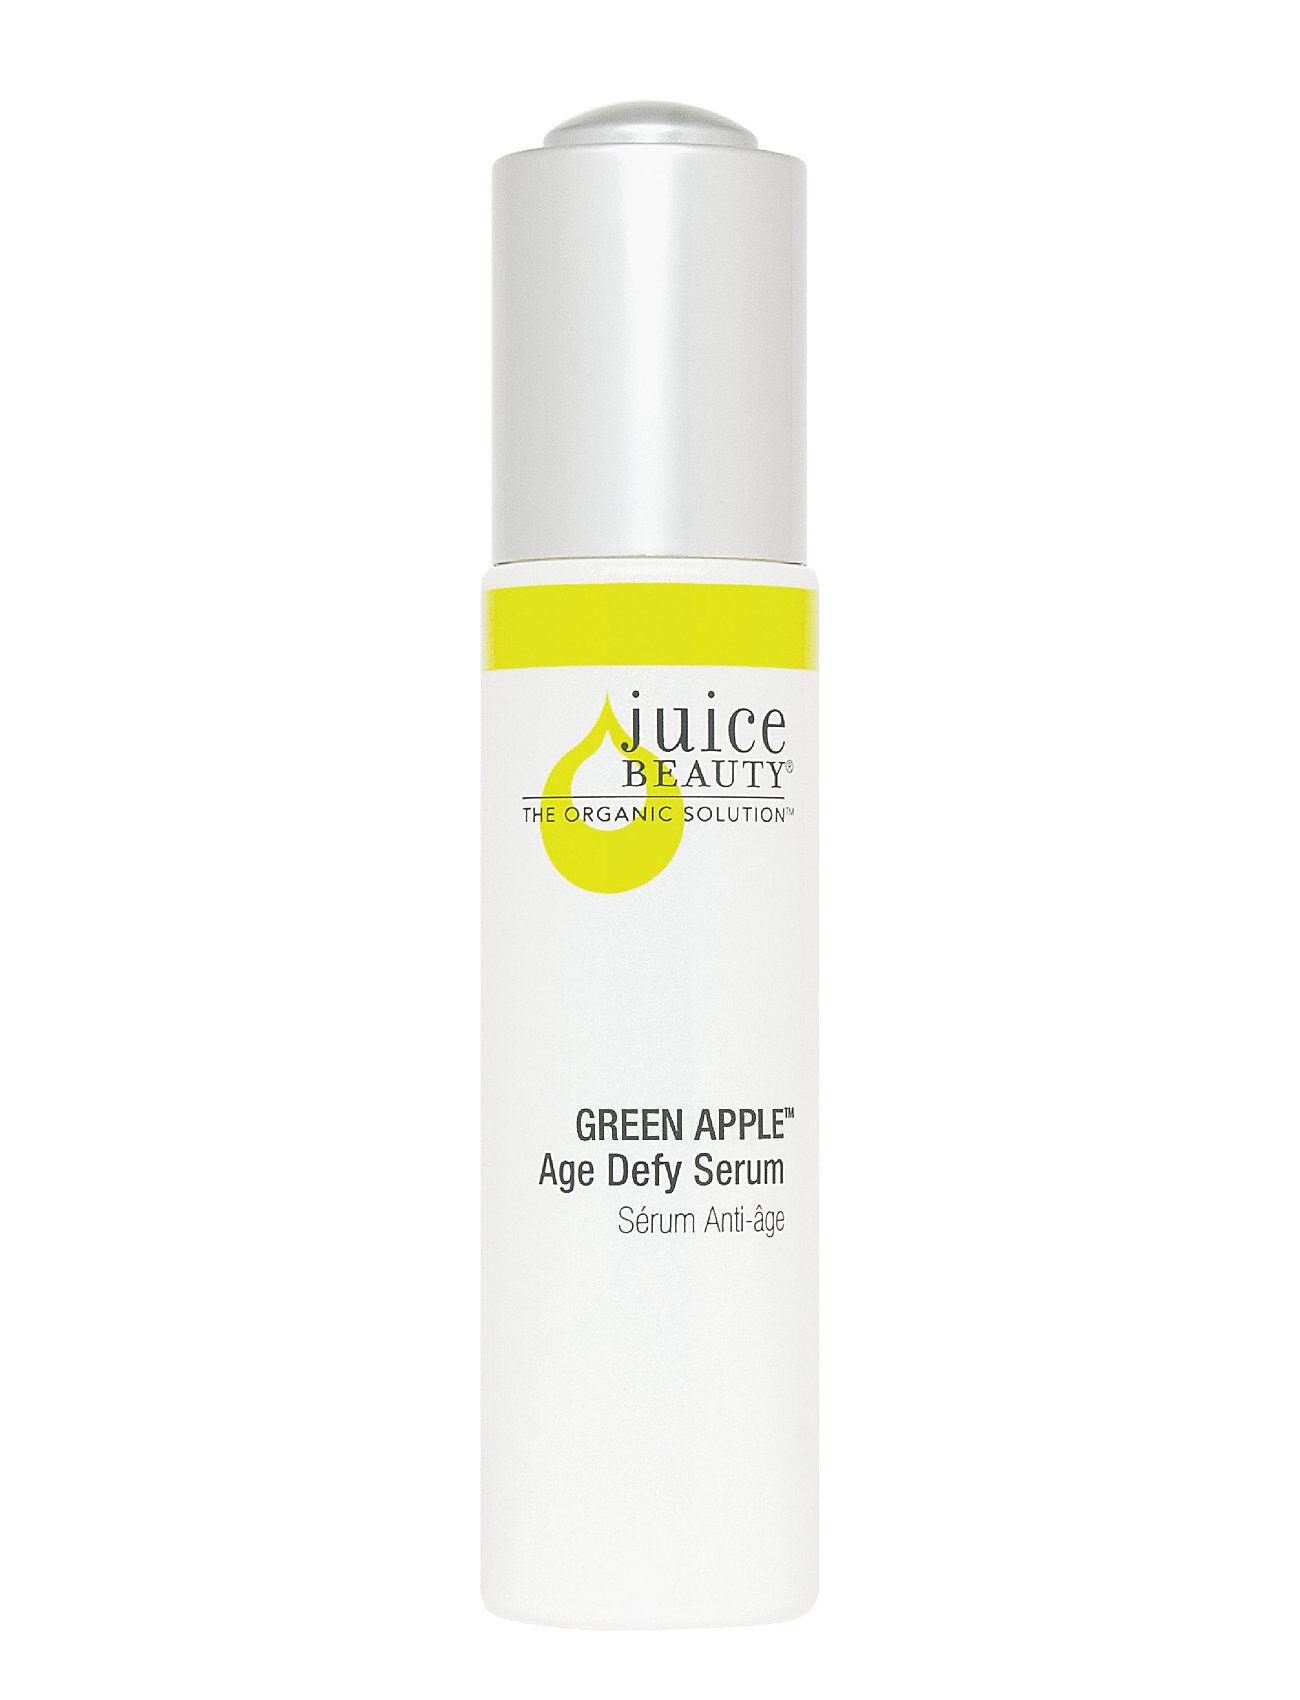 Juice Beauty Green Apple™ Age Defy Serum